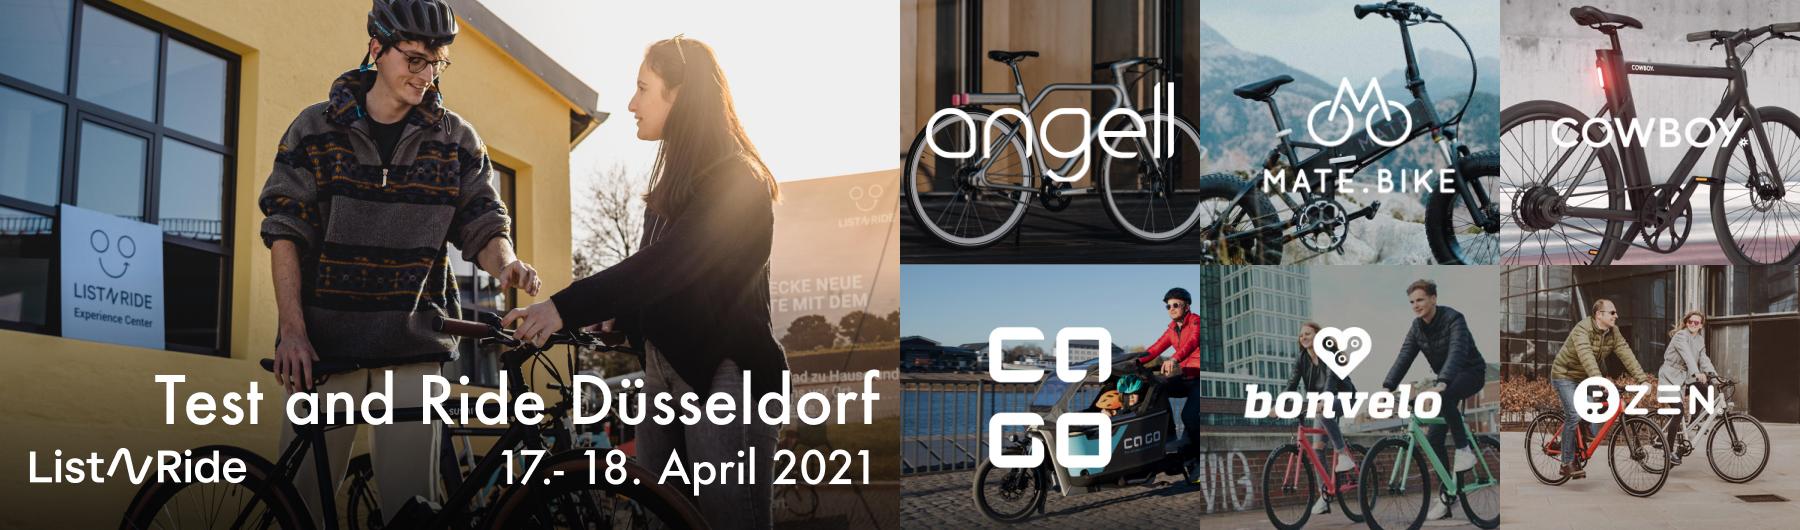 Test and Ride Düsseldorf